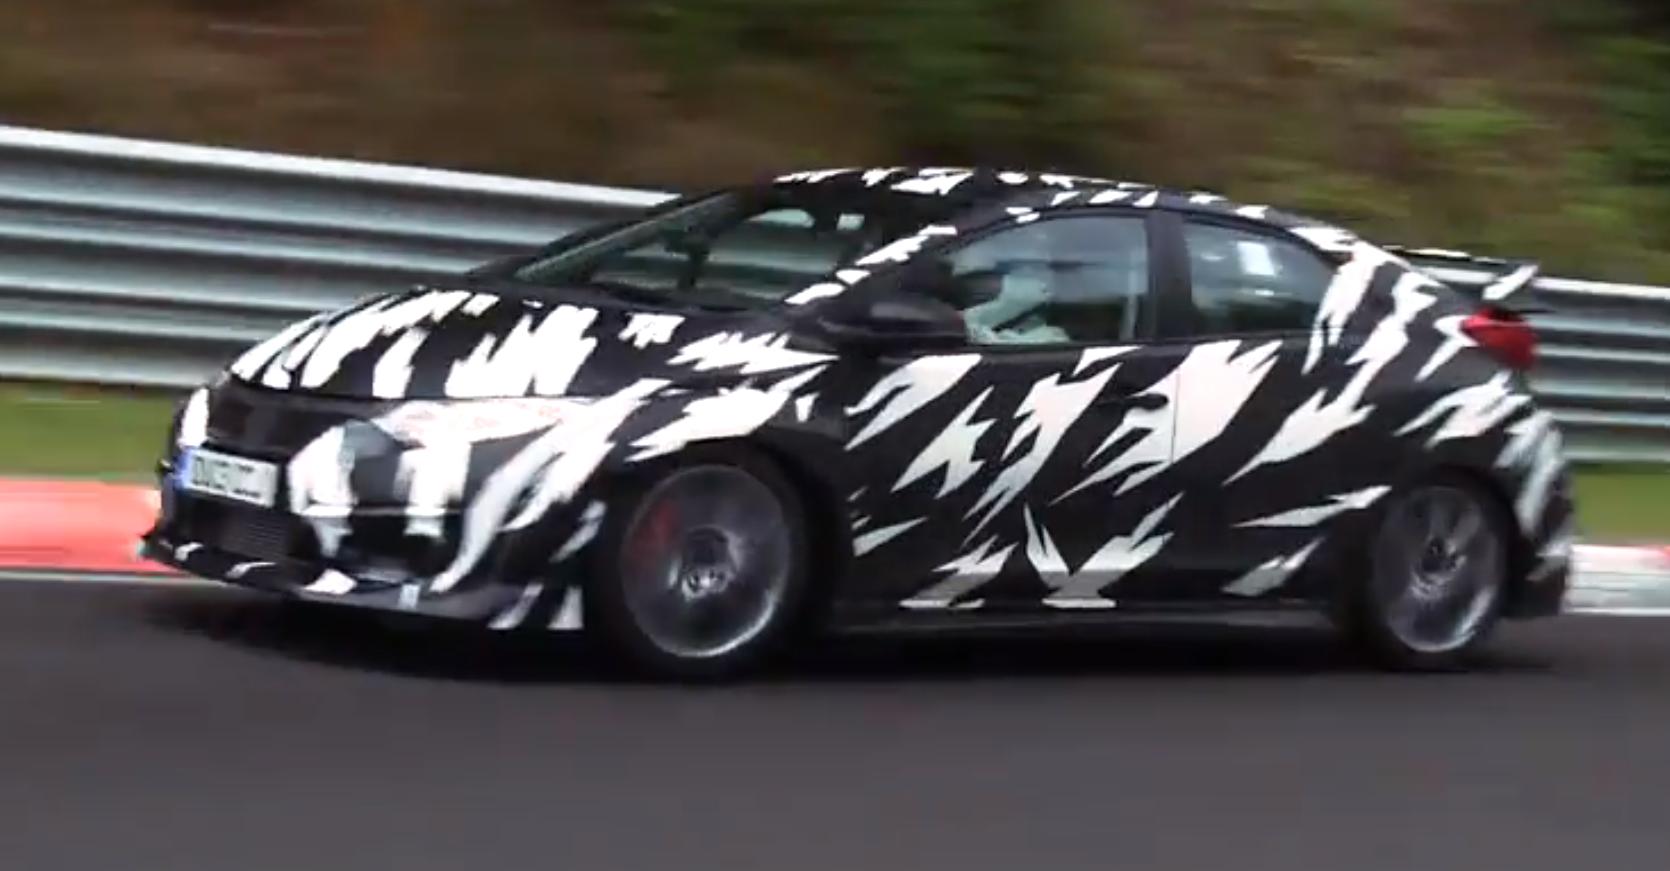 First Honda Civic First Video of 300 hp Honda